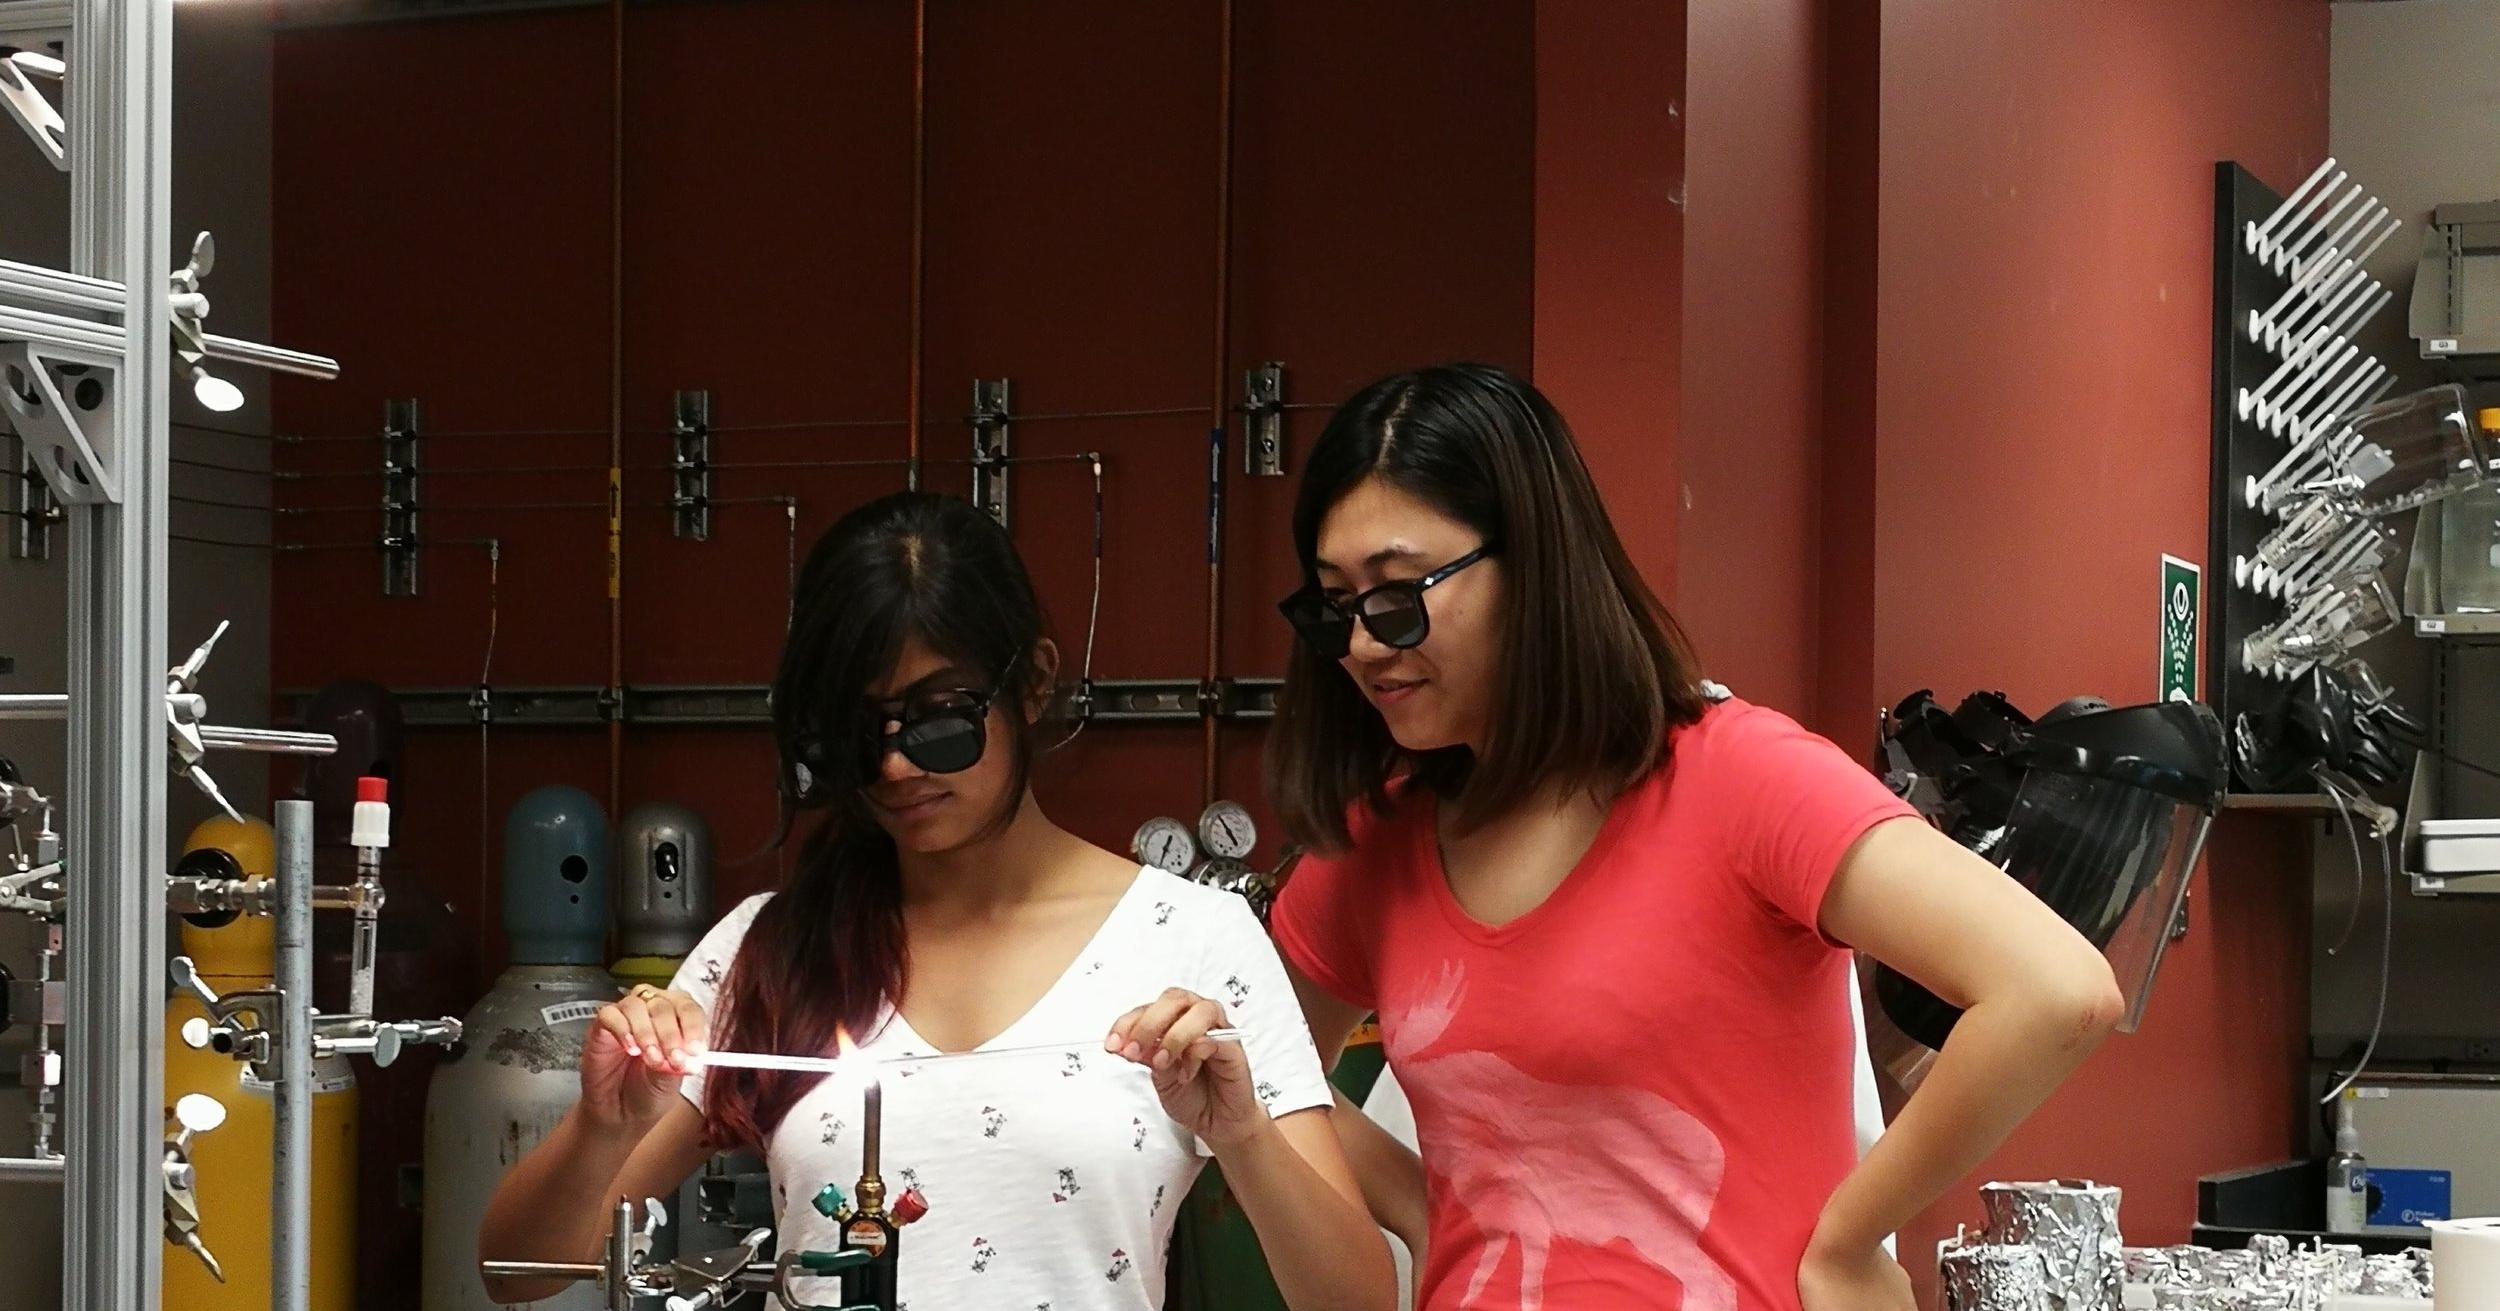 Huanting teaching Asmita how to make quartz glass breakseals (Photo by Tao Sun).